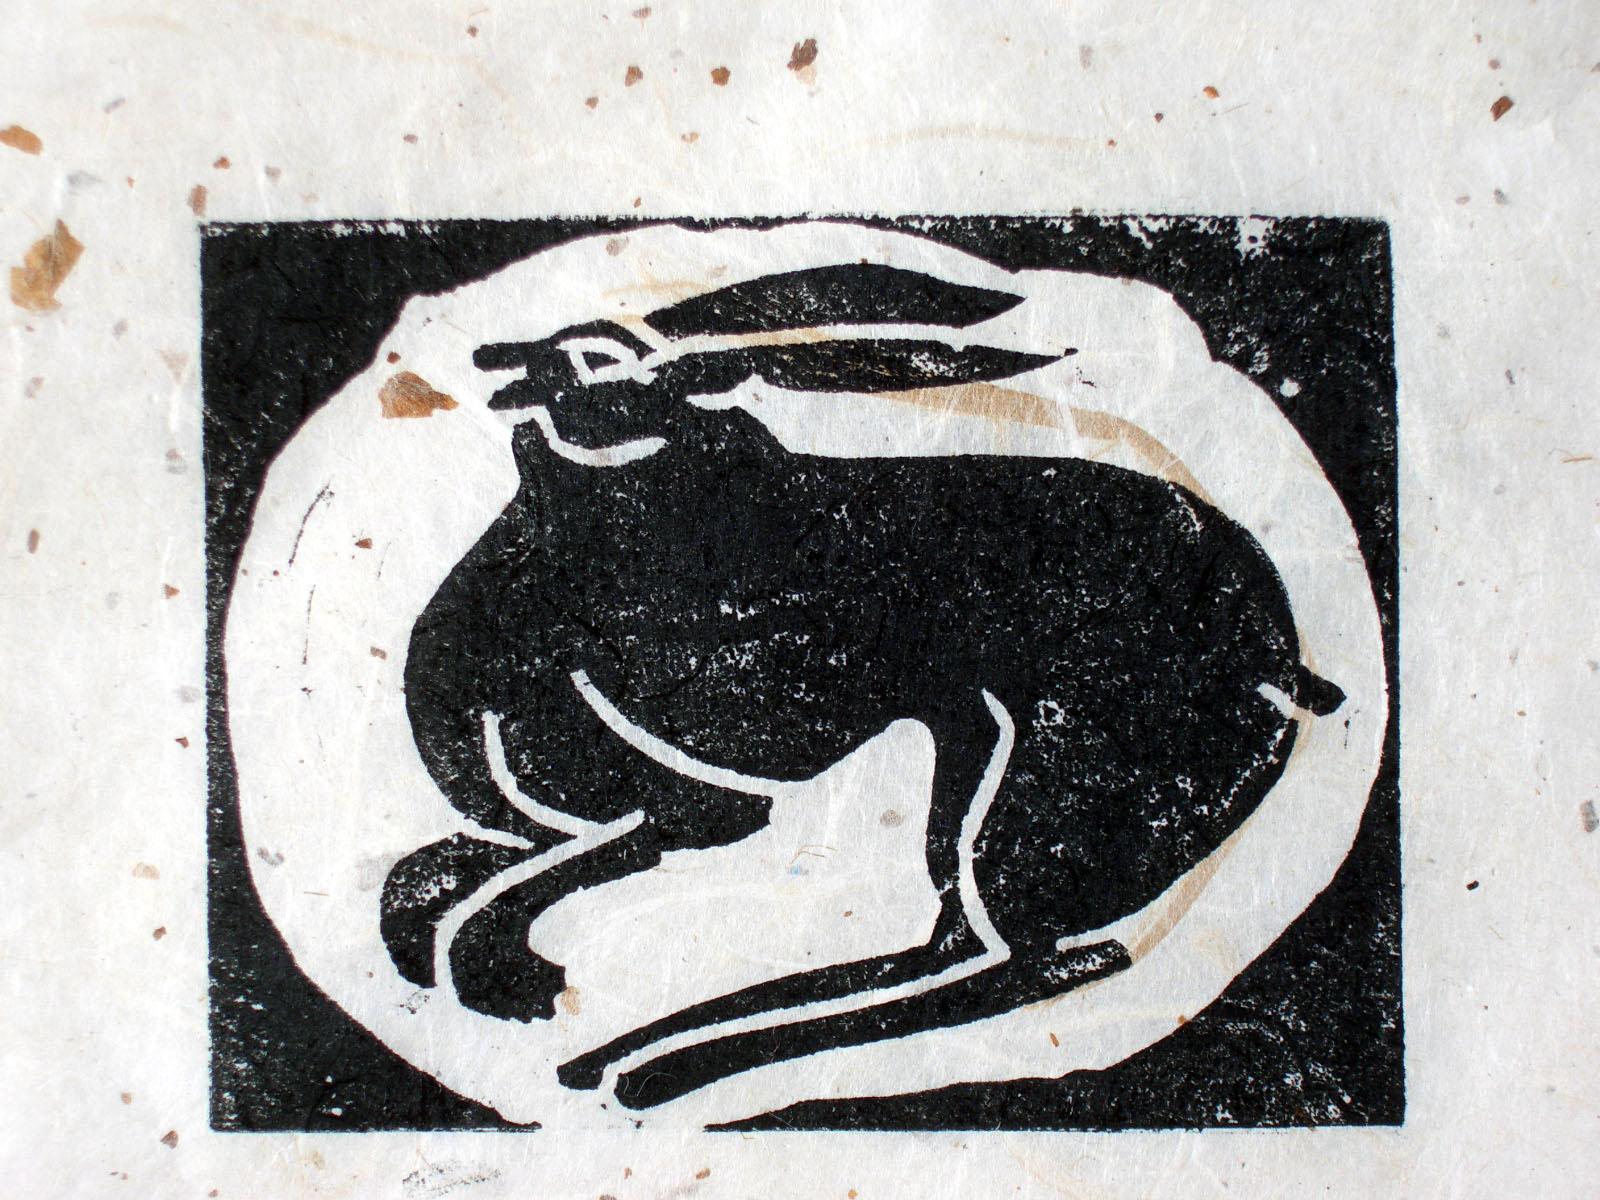 Helen Pakeman 'Nesting Hare 2'